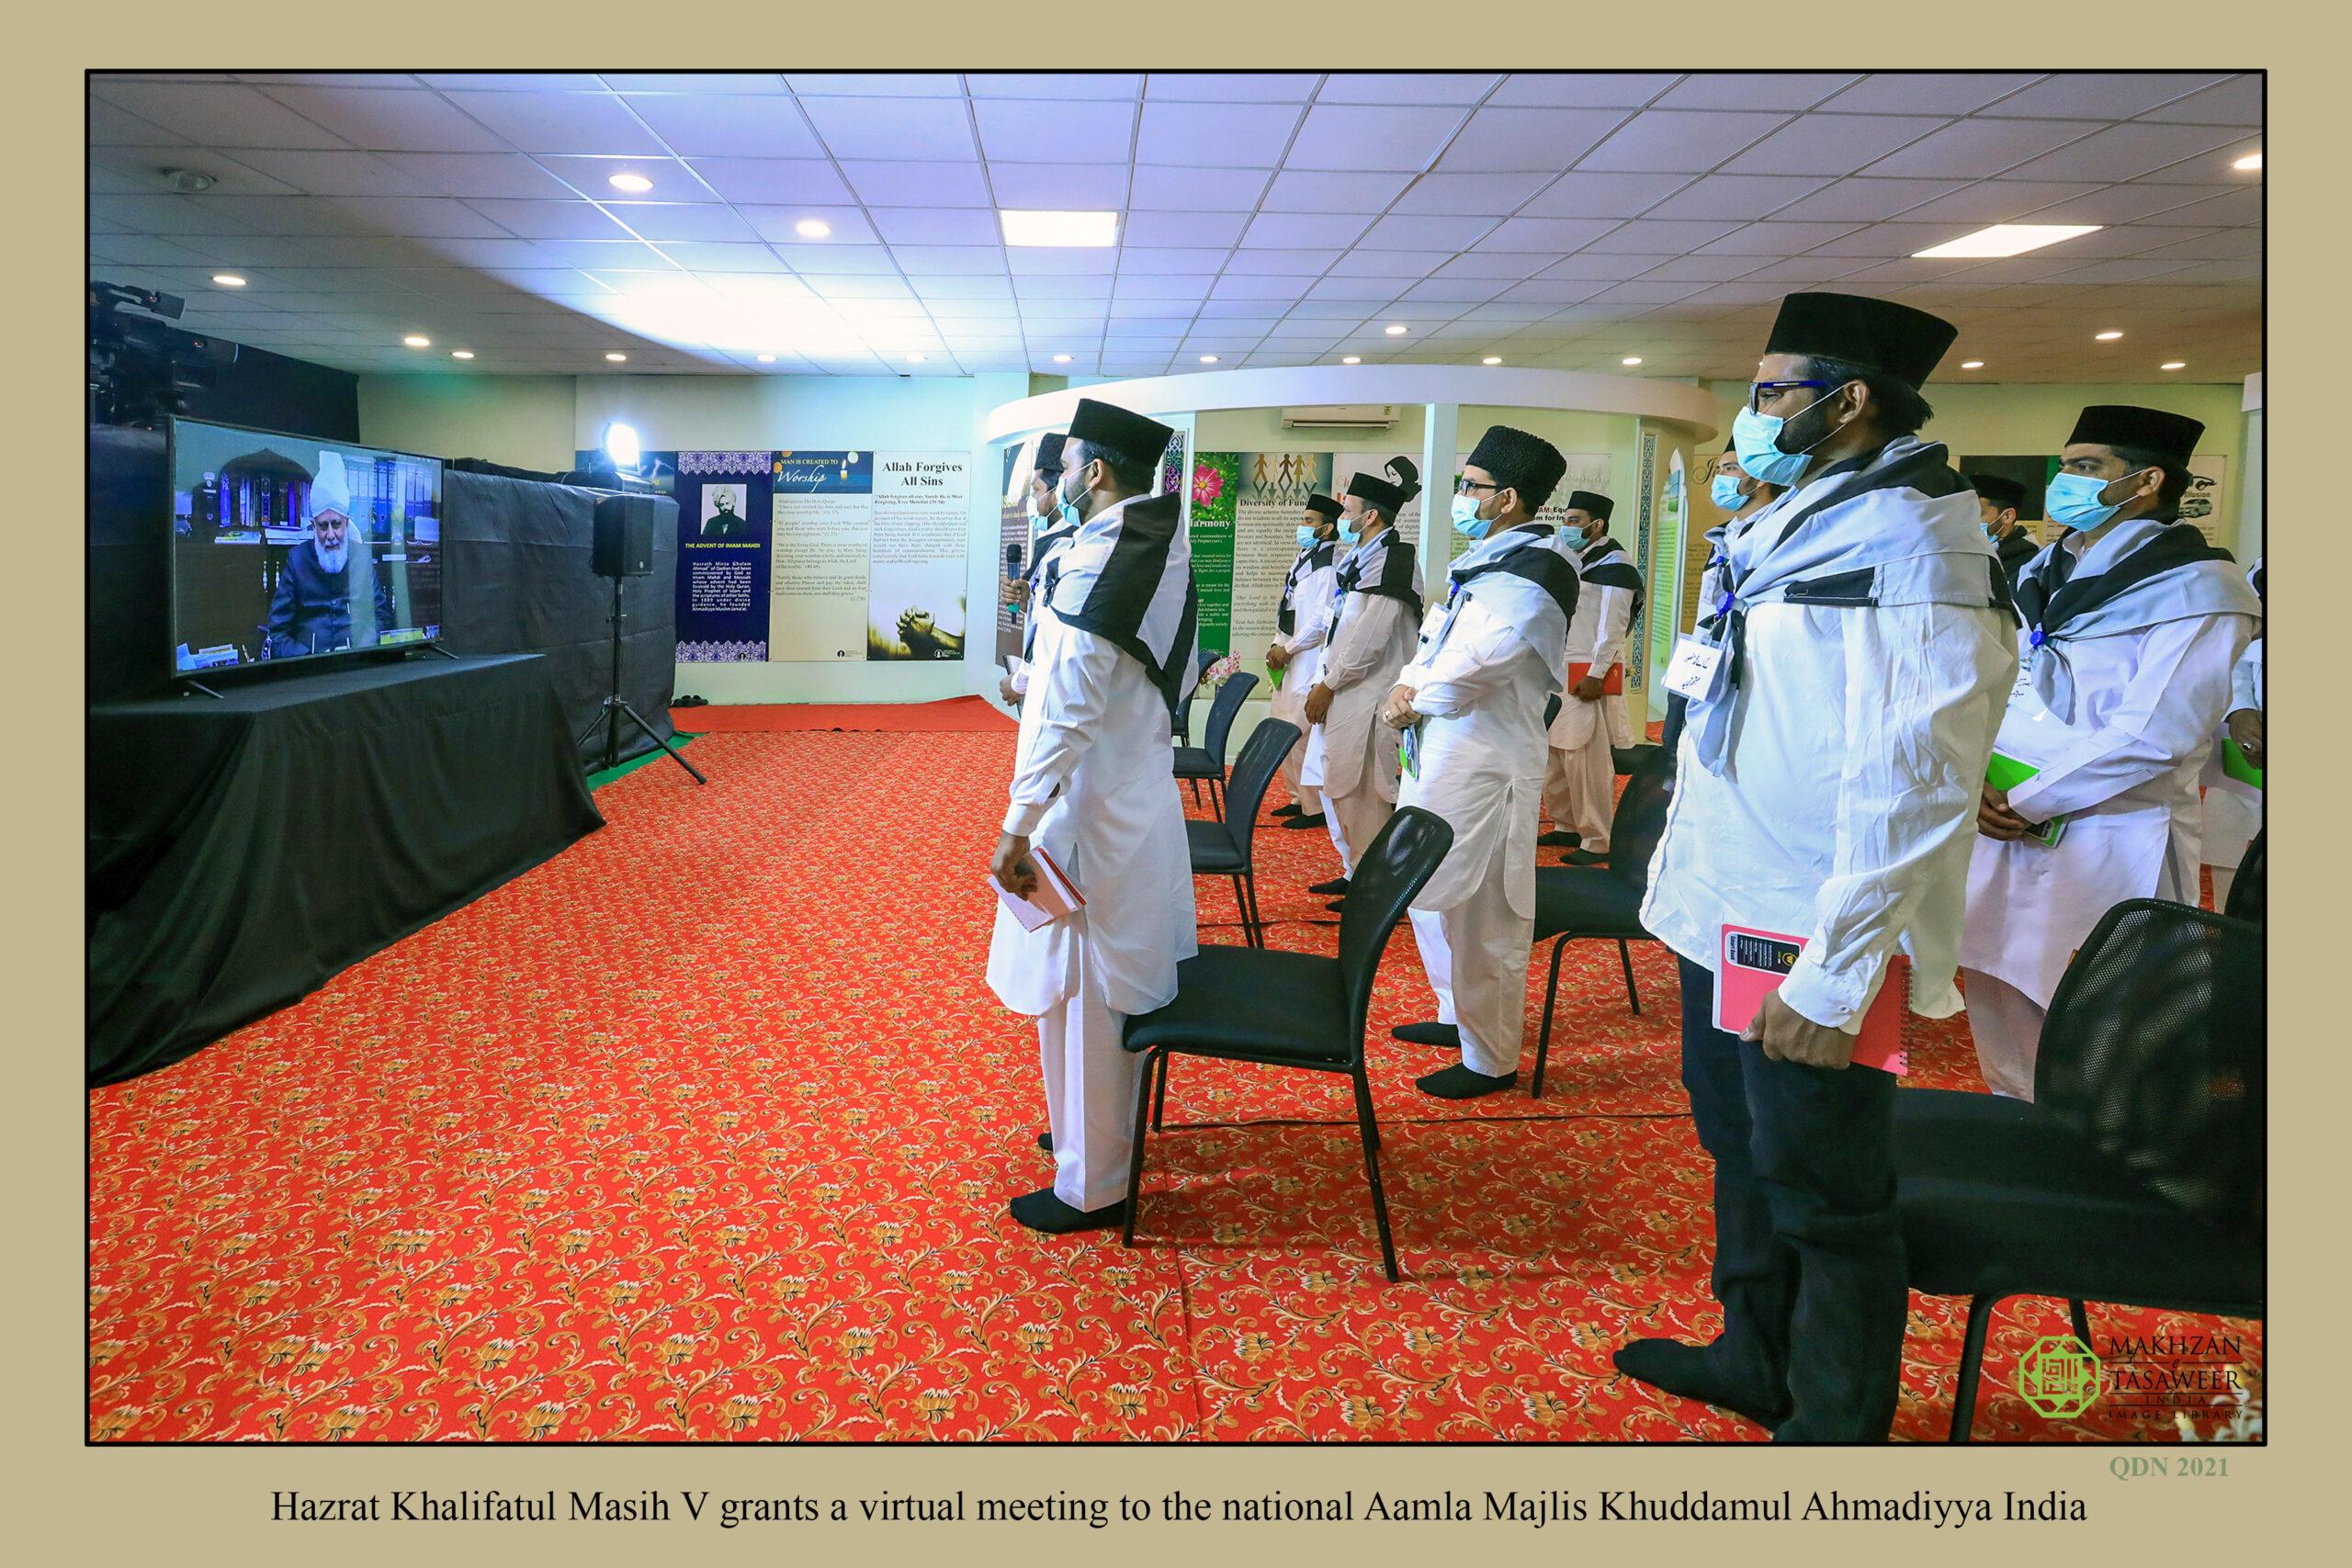 Hazrat Khalifatul Masih V grants a virtual meeting to the national Aamla Majlis Khuddamul Ahmadiyya India 001